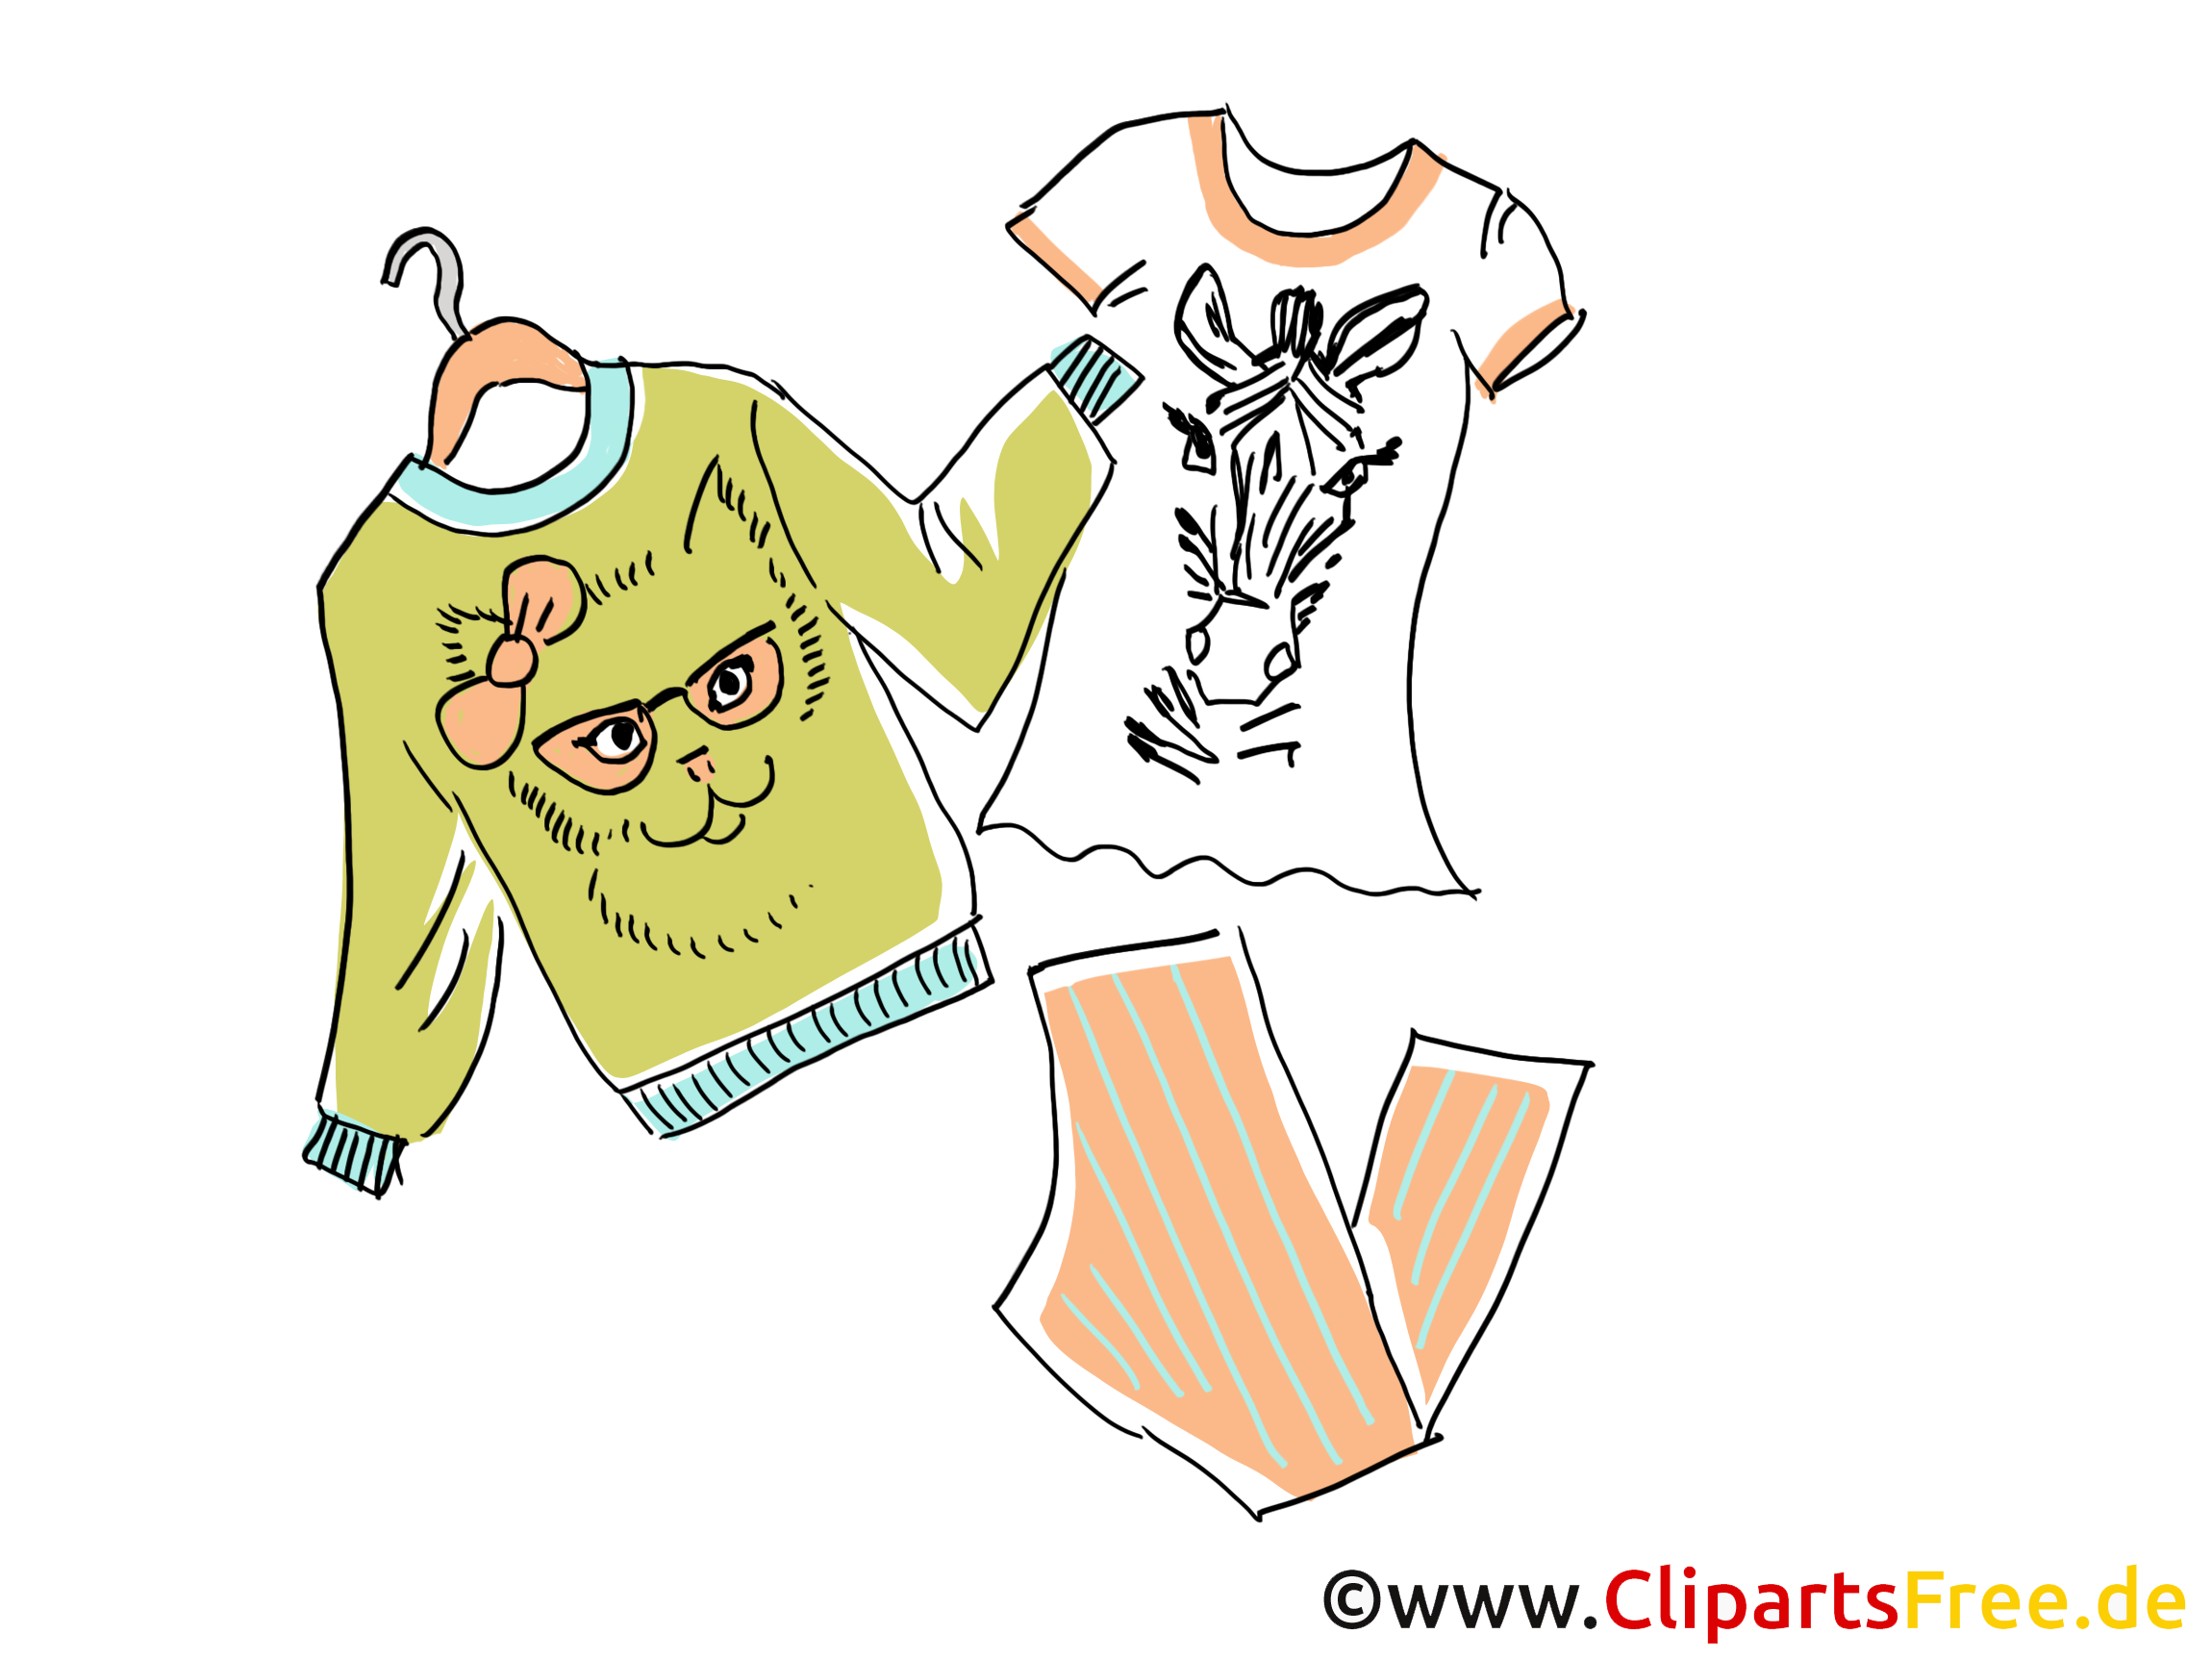 Designer Mode Clipart, Bild, Illustration, Grafik, Image kostenlos.